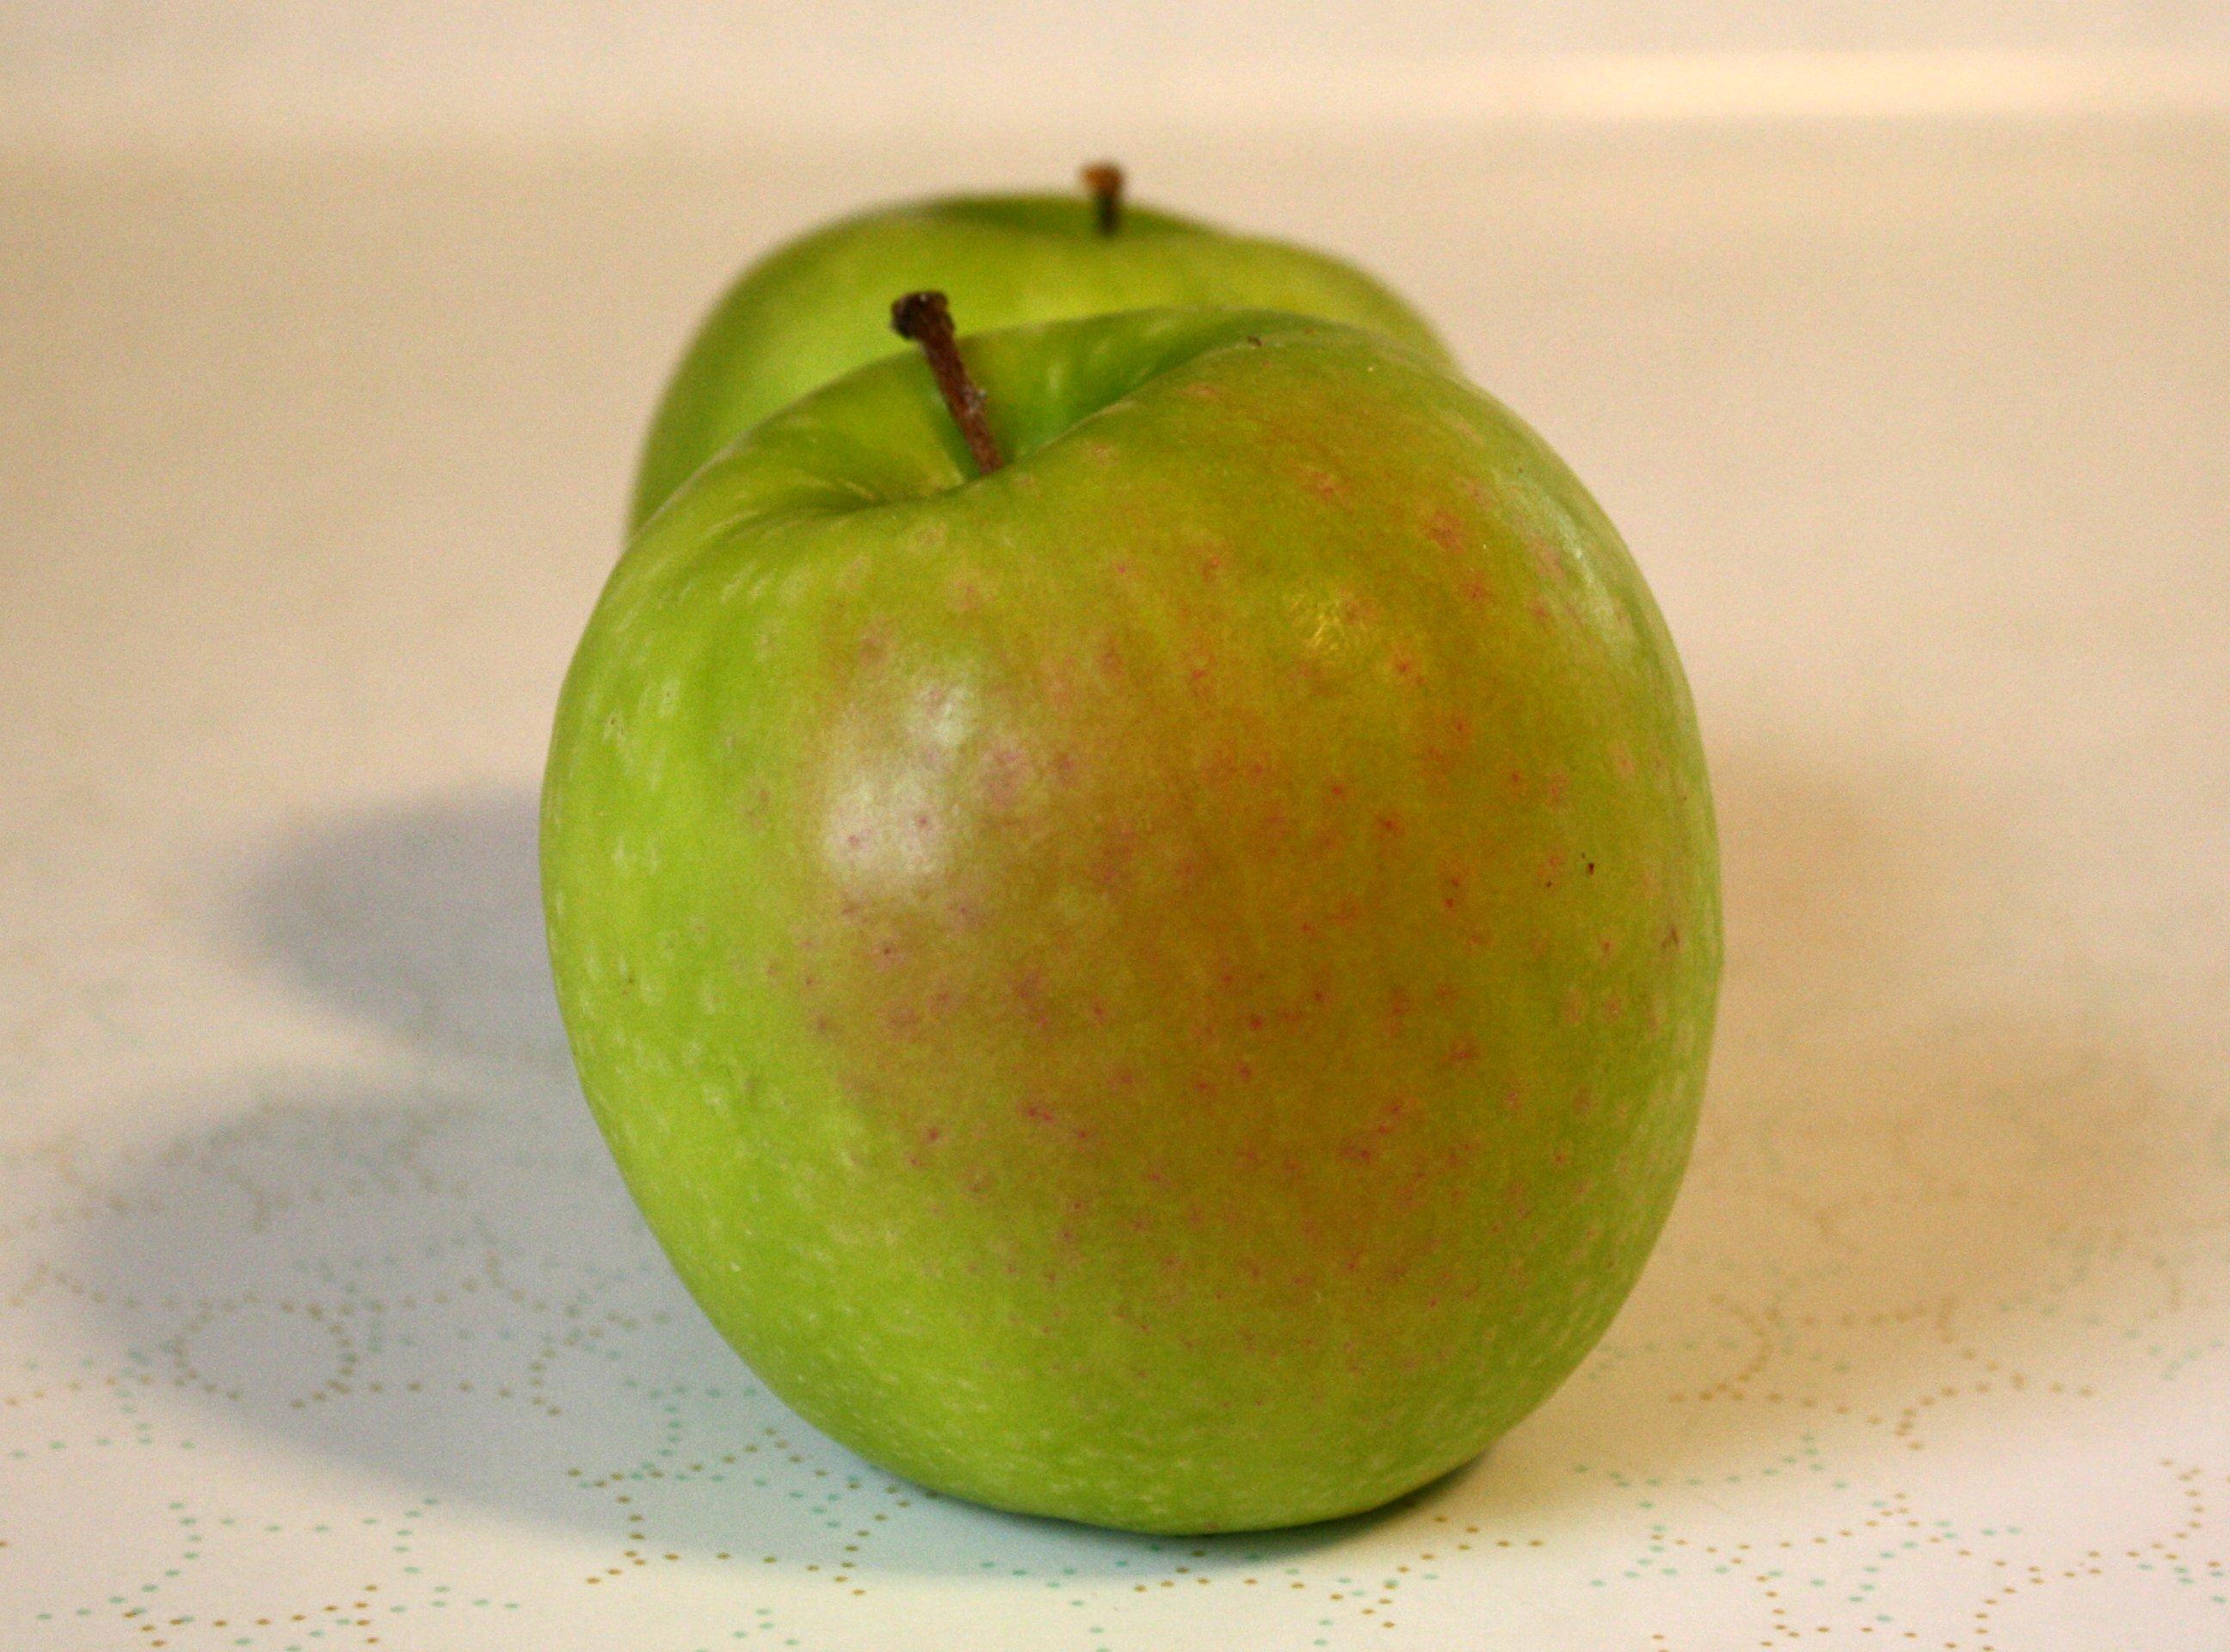 Green Apple Picture | Free Photograph | Photos Public Domain